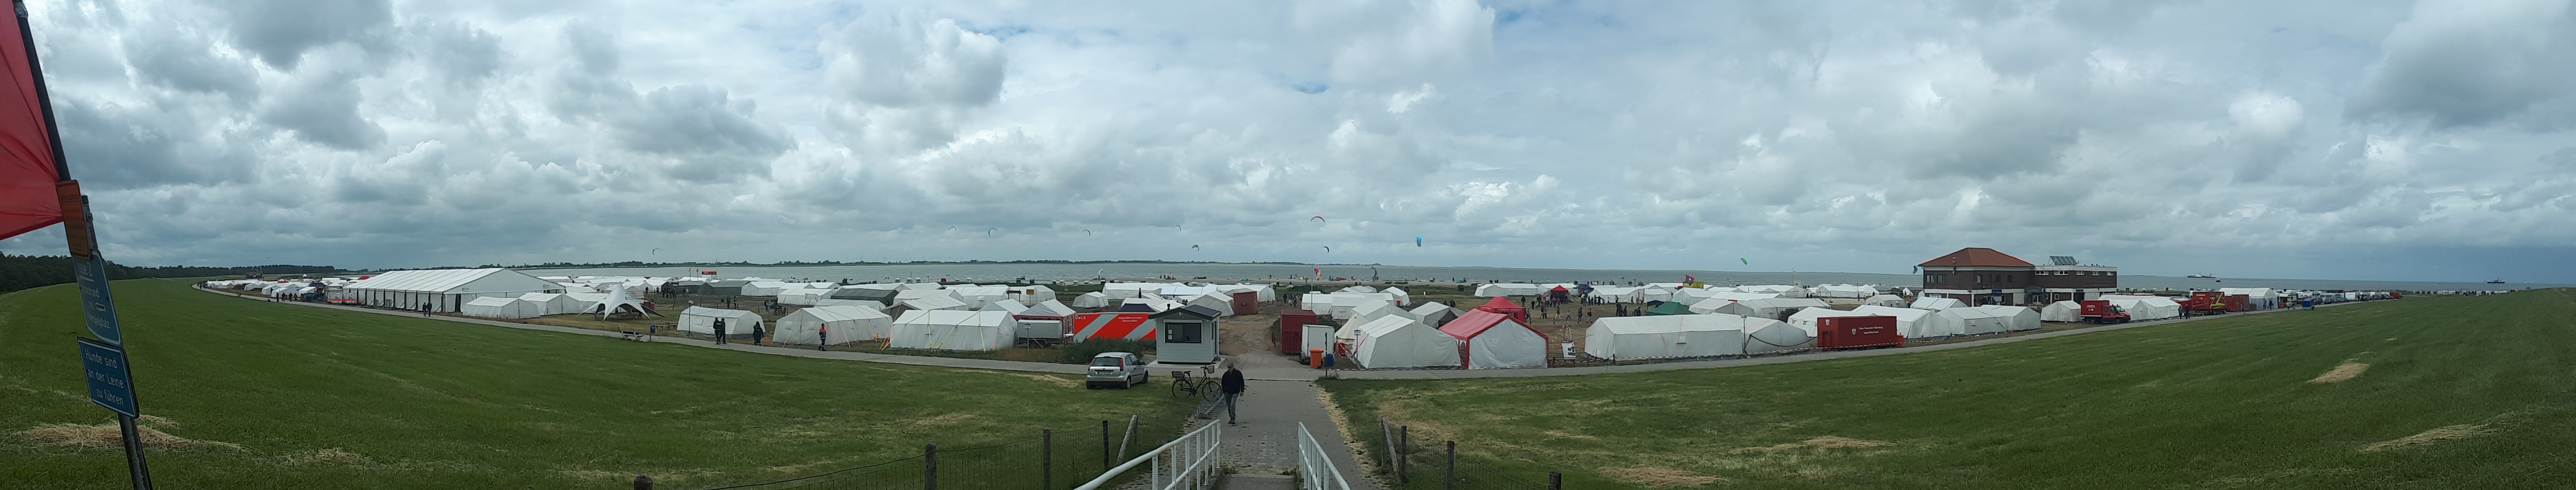 Panorama Zeltlager